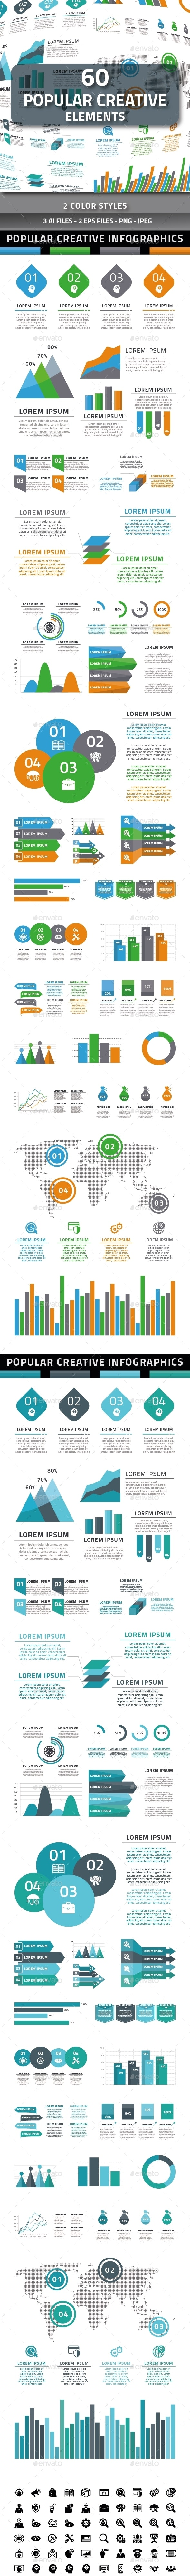 Popular Creative Elements - Infographics